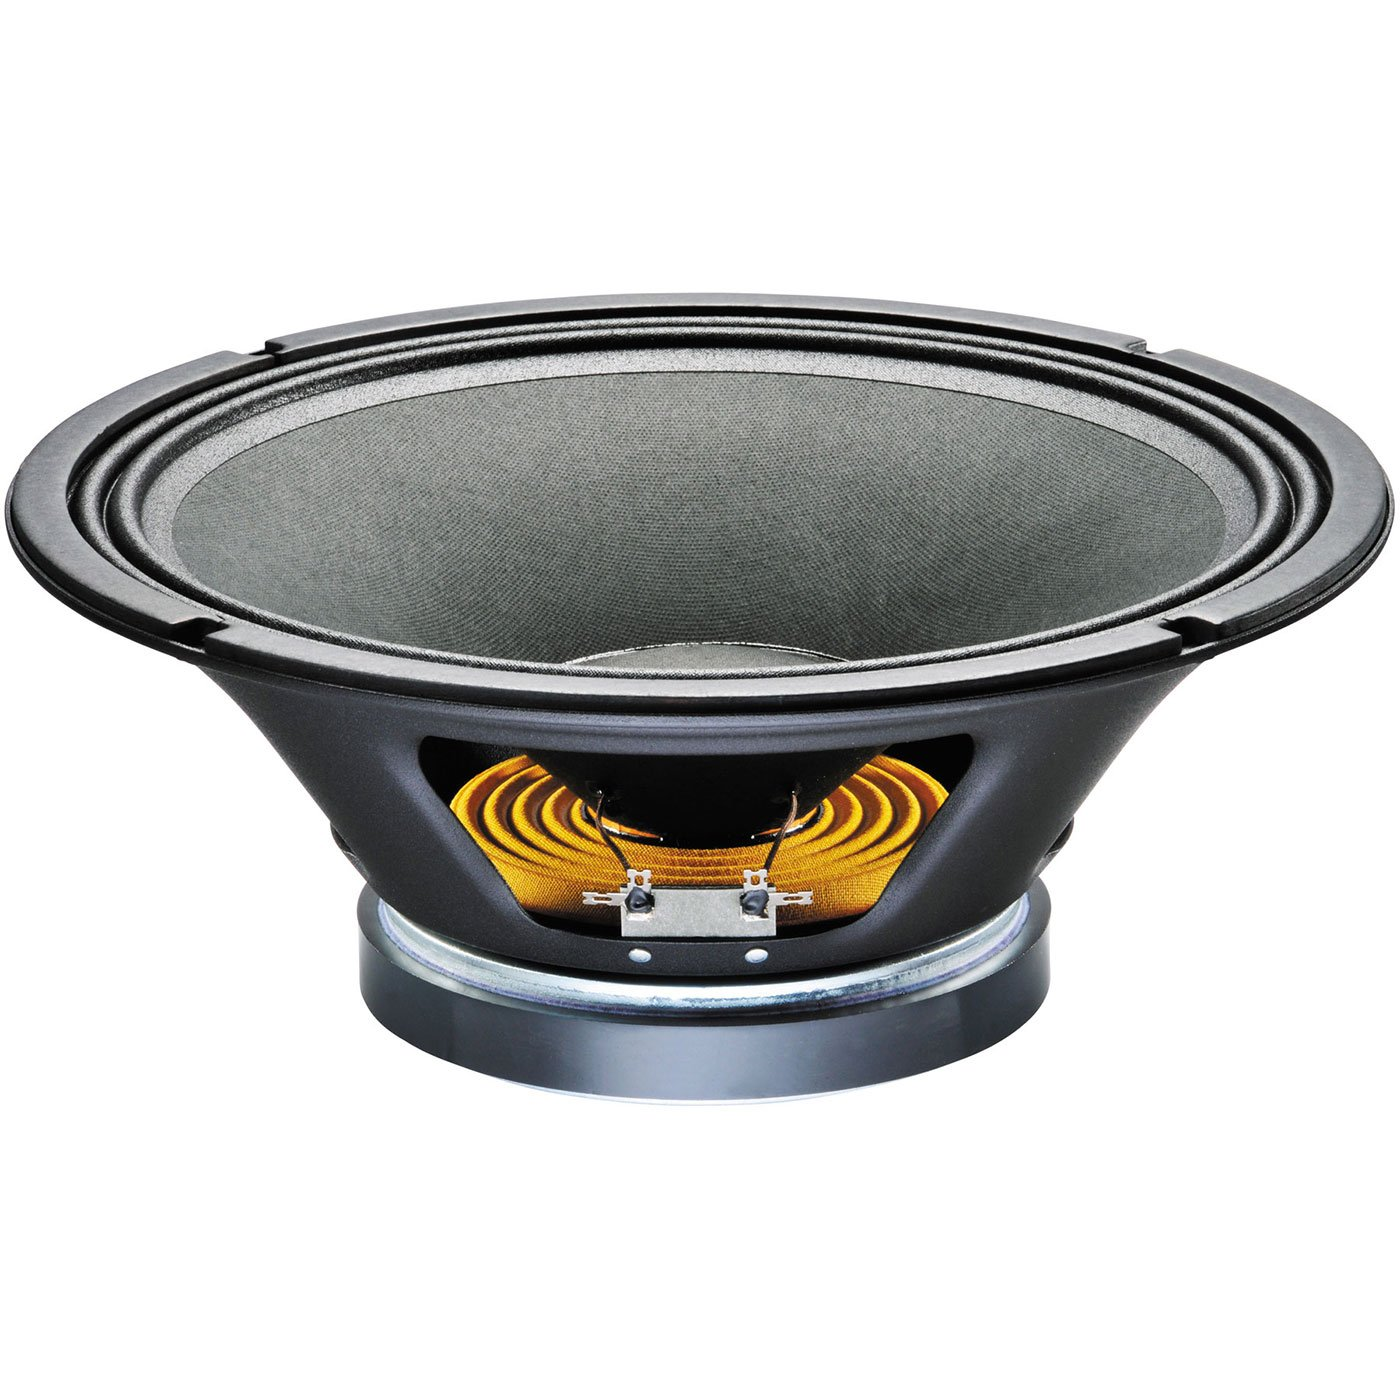 Celestion TF 1220 150 Watt Raw Frame Speaker 8 Ohm, 12 inch